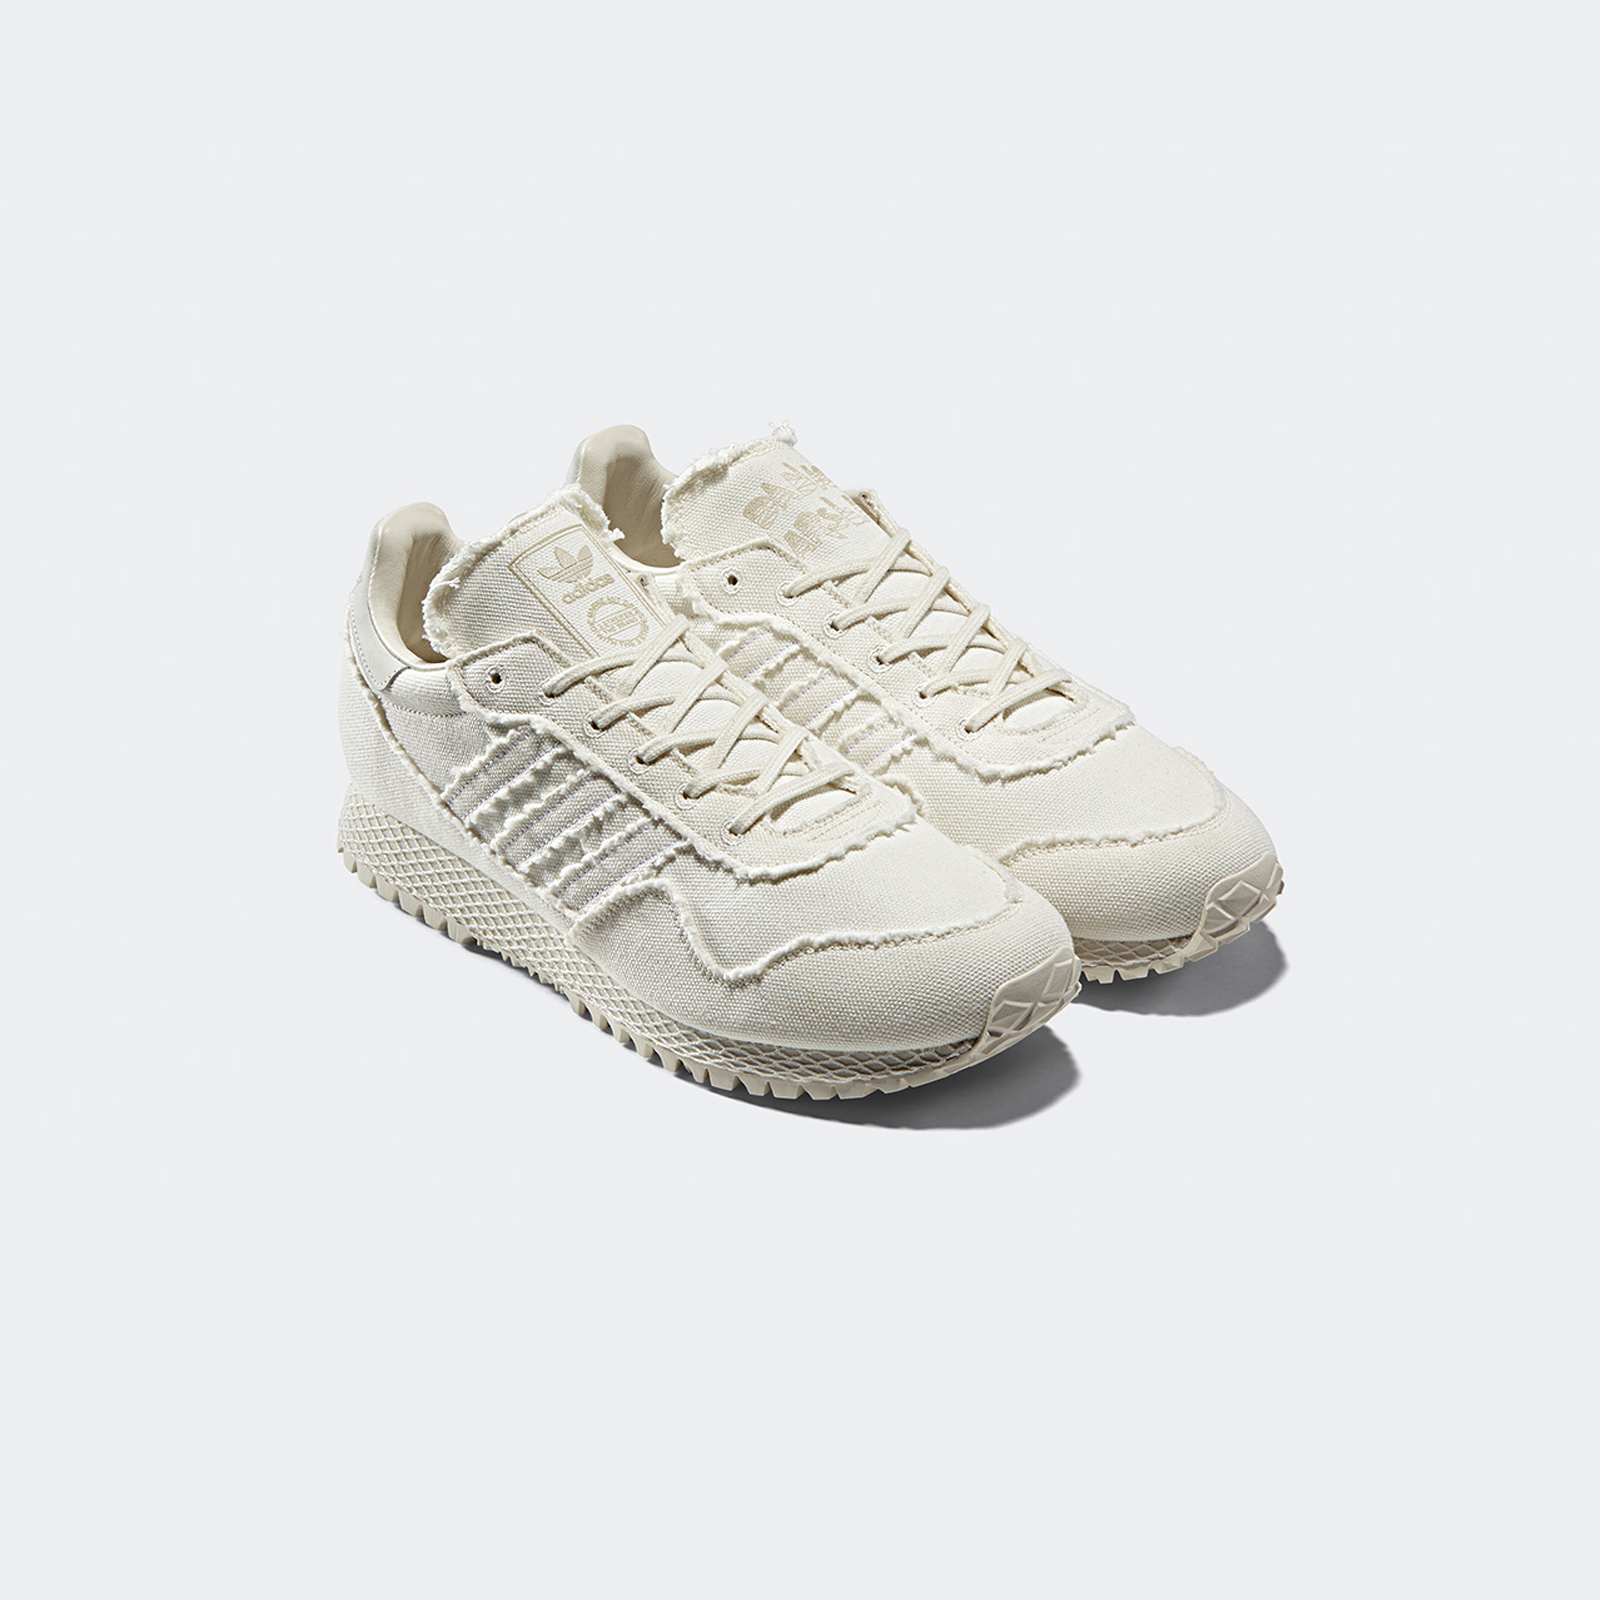 best sneakers 61cdd b7846 adidas Originals New York x Daniel Arsham - 4. Close